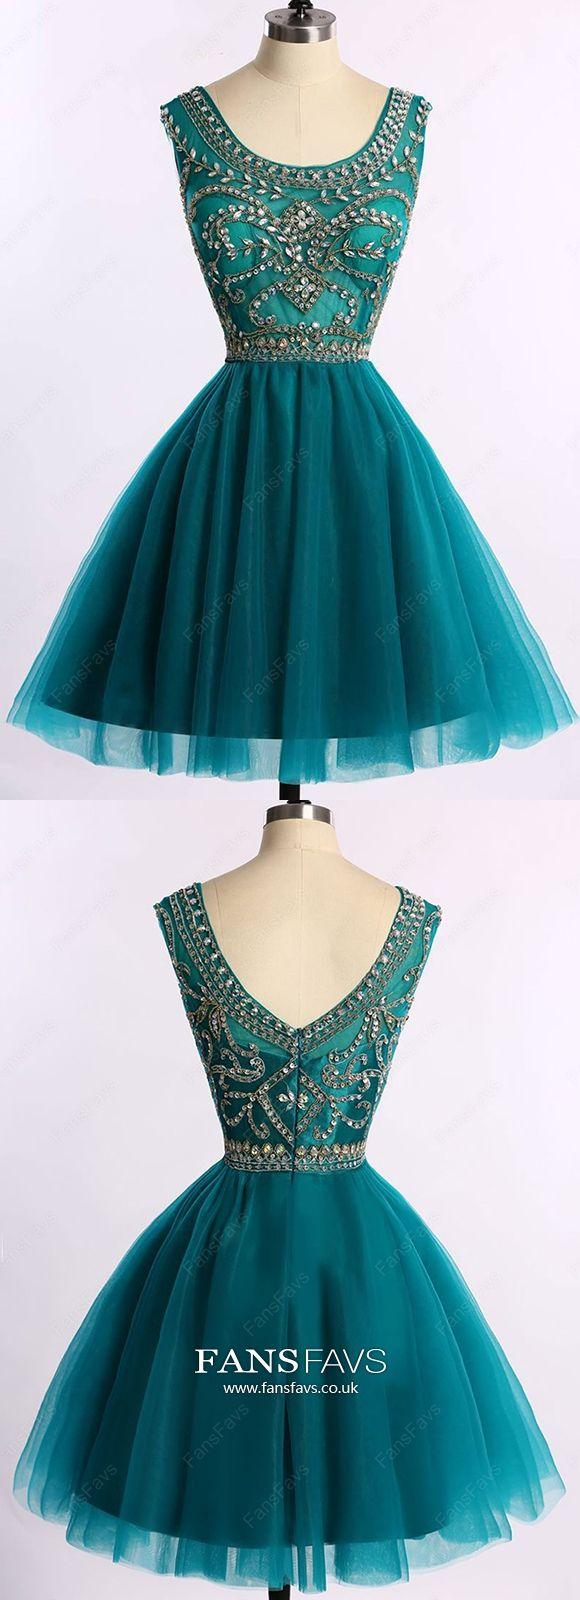 Dark green homecoming dresses a line short prom dresses elegant